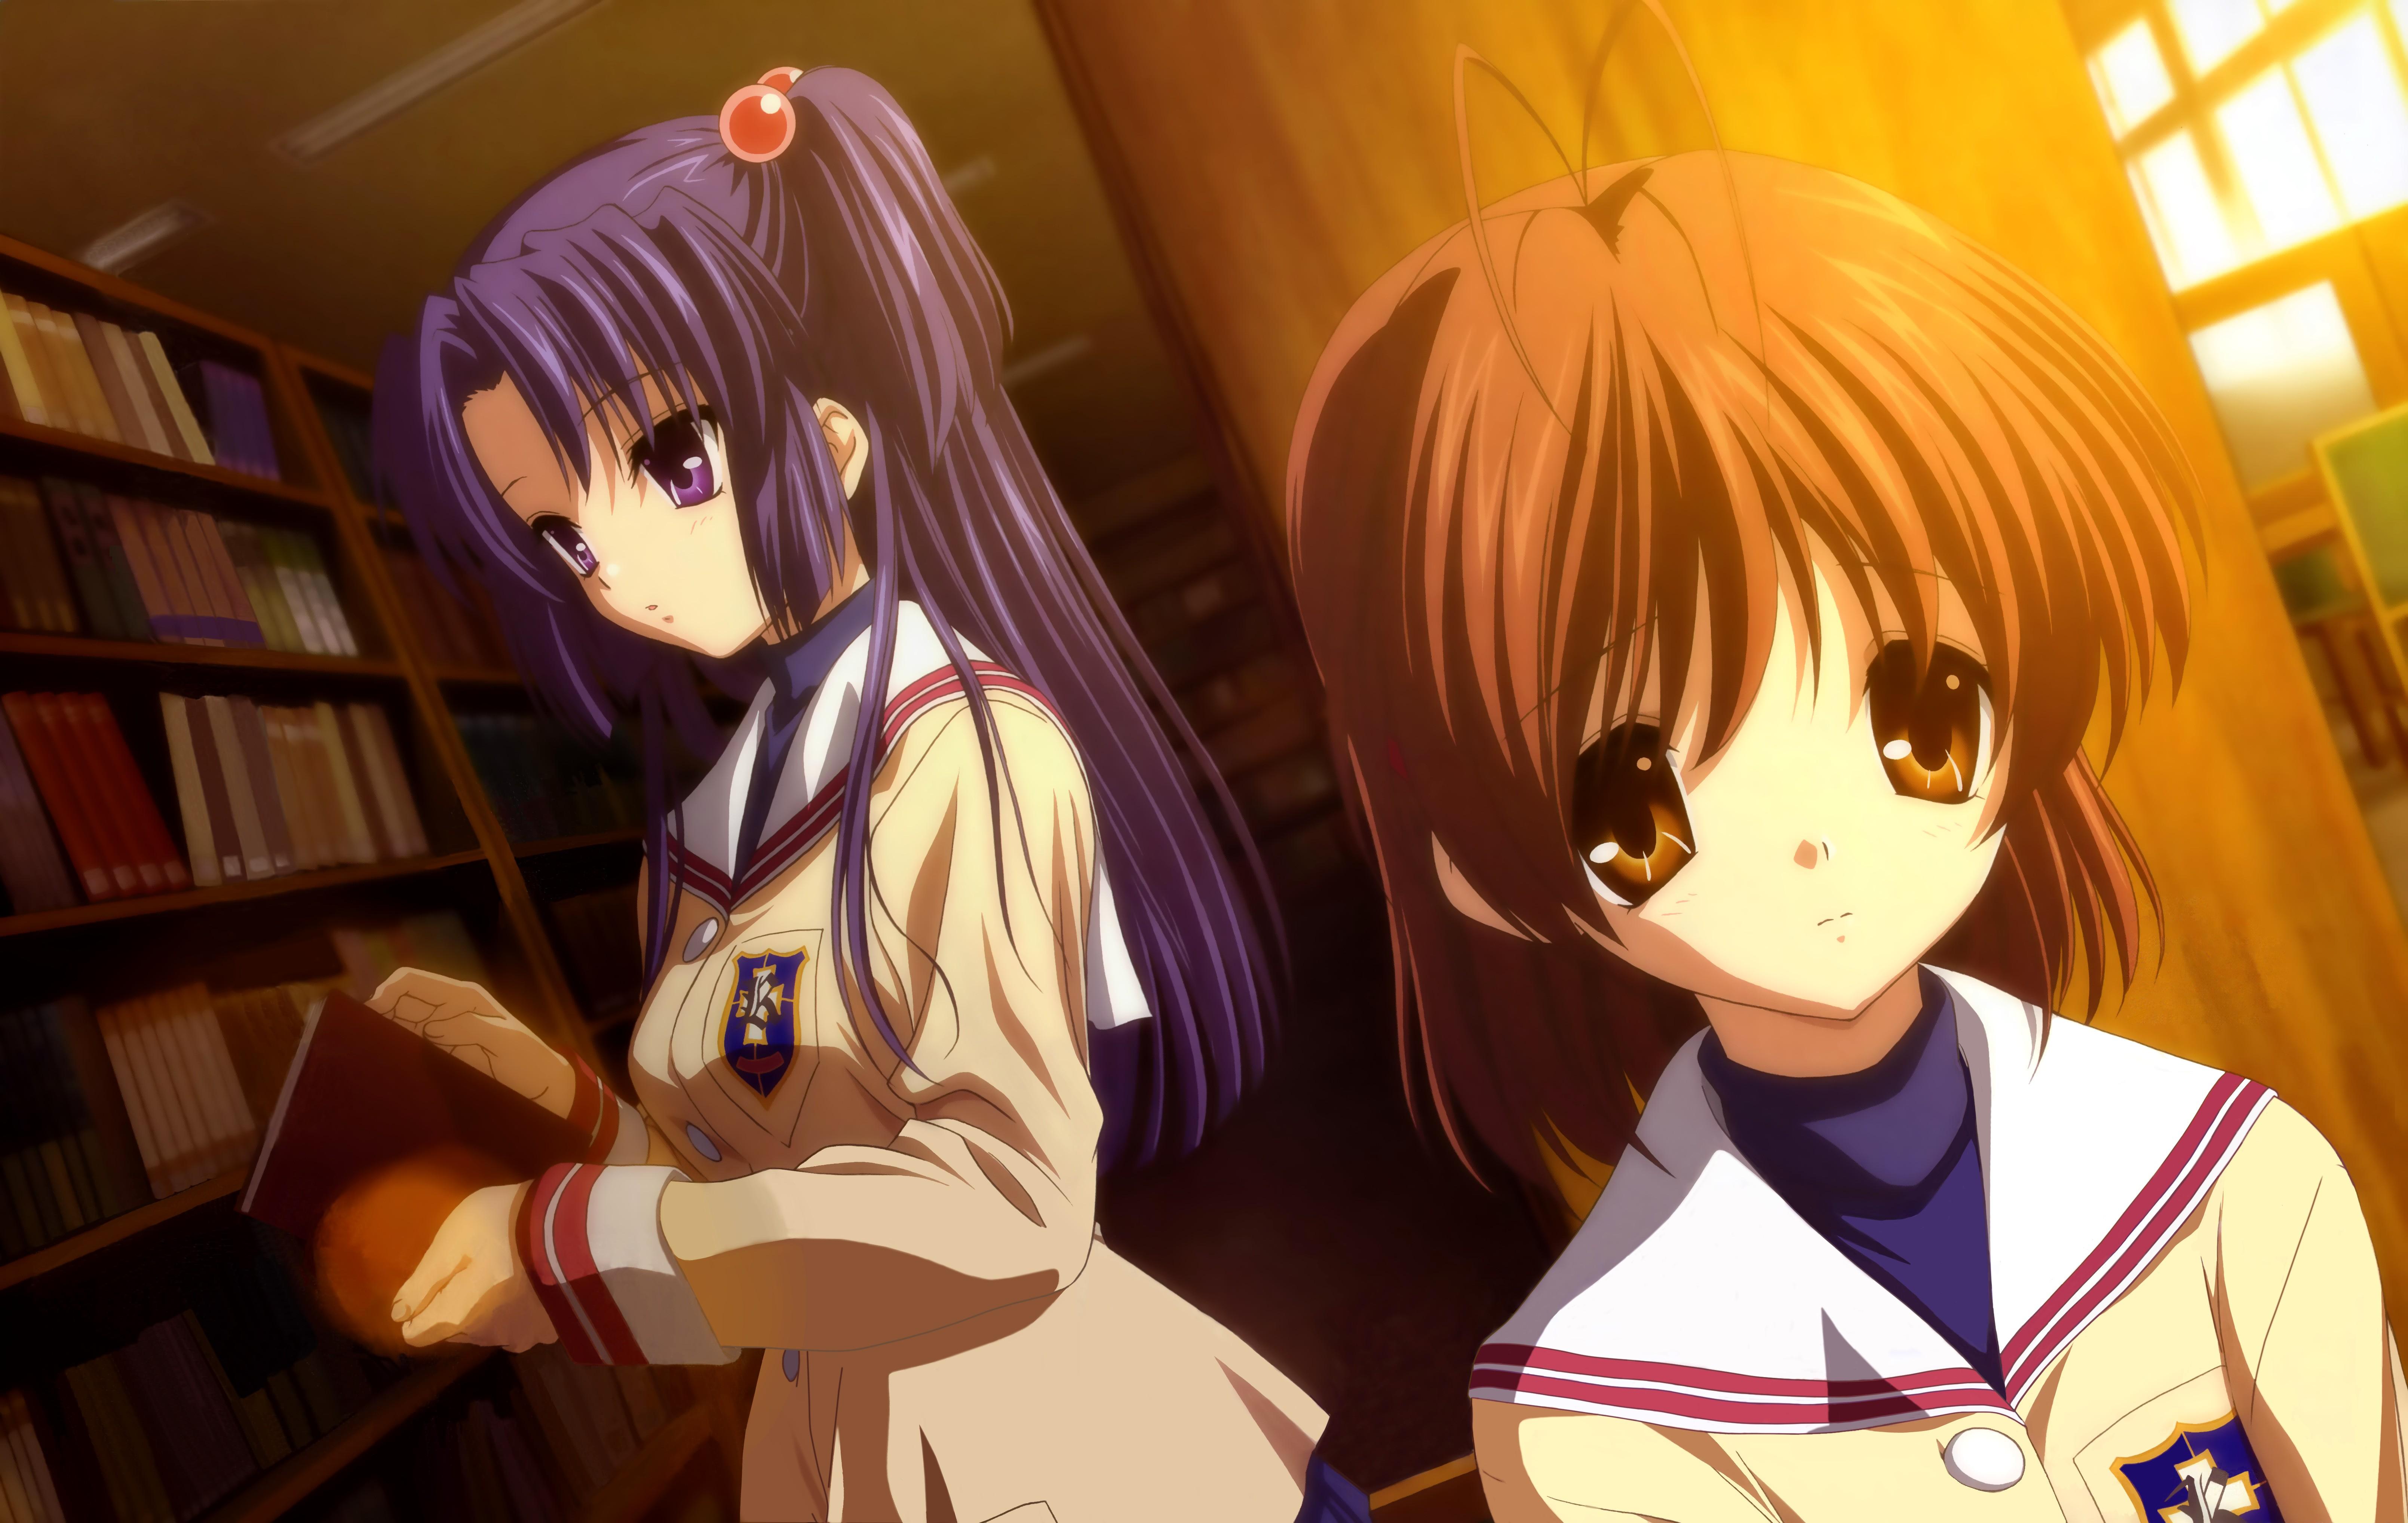 Wallpaper Anime Girls Artwork Clannad Screenshot Mangaka